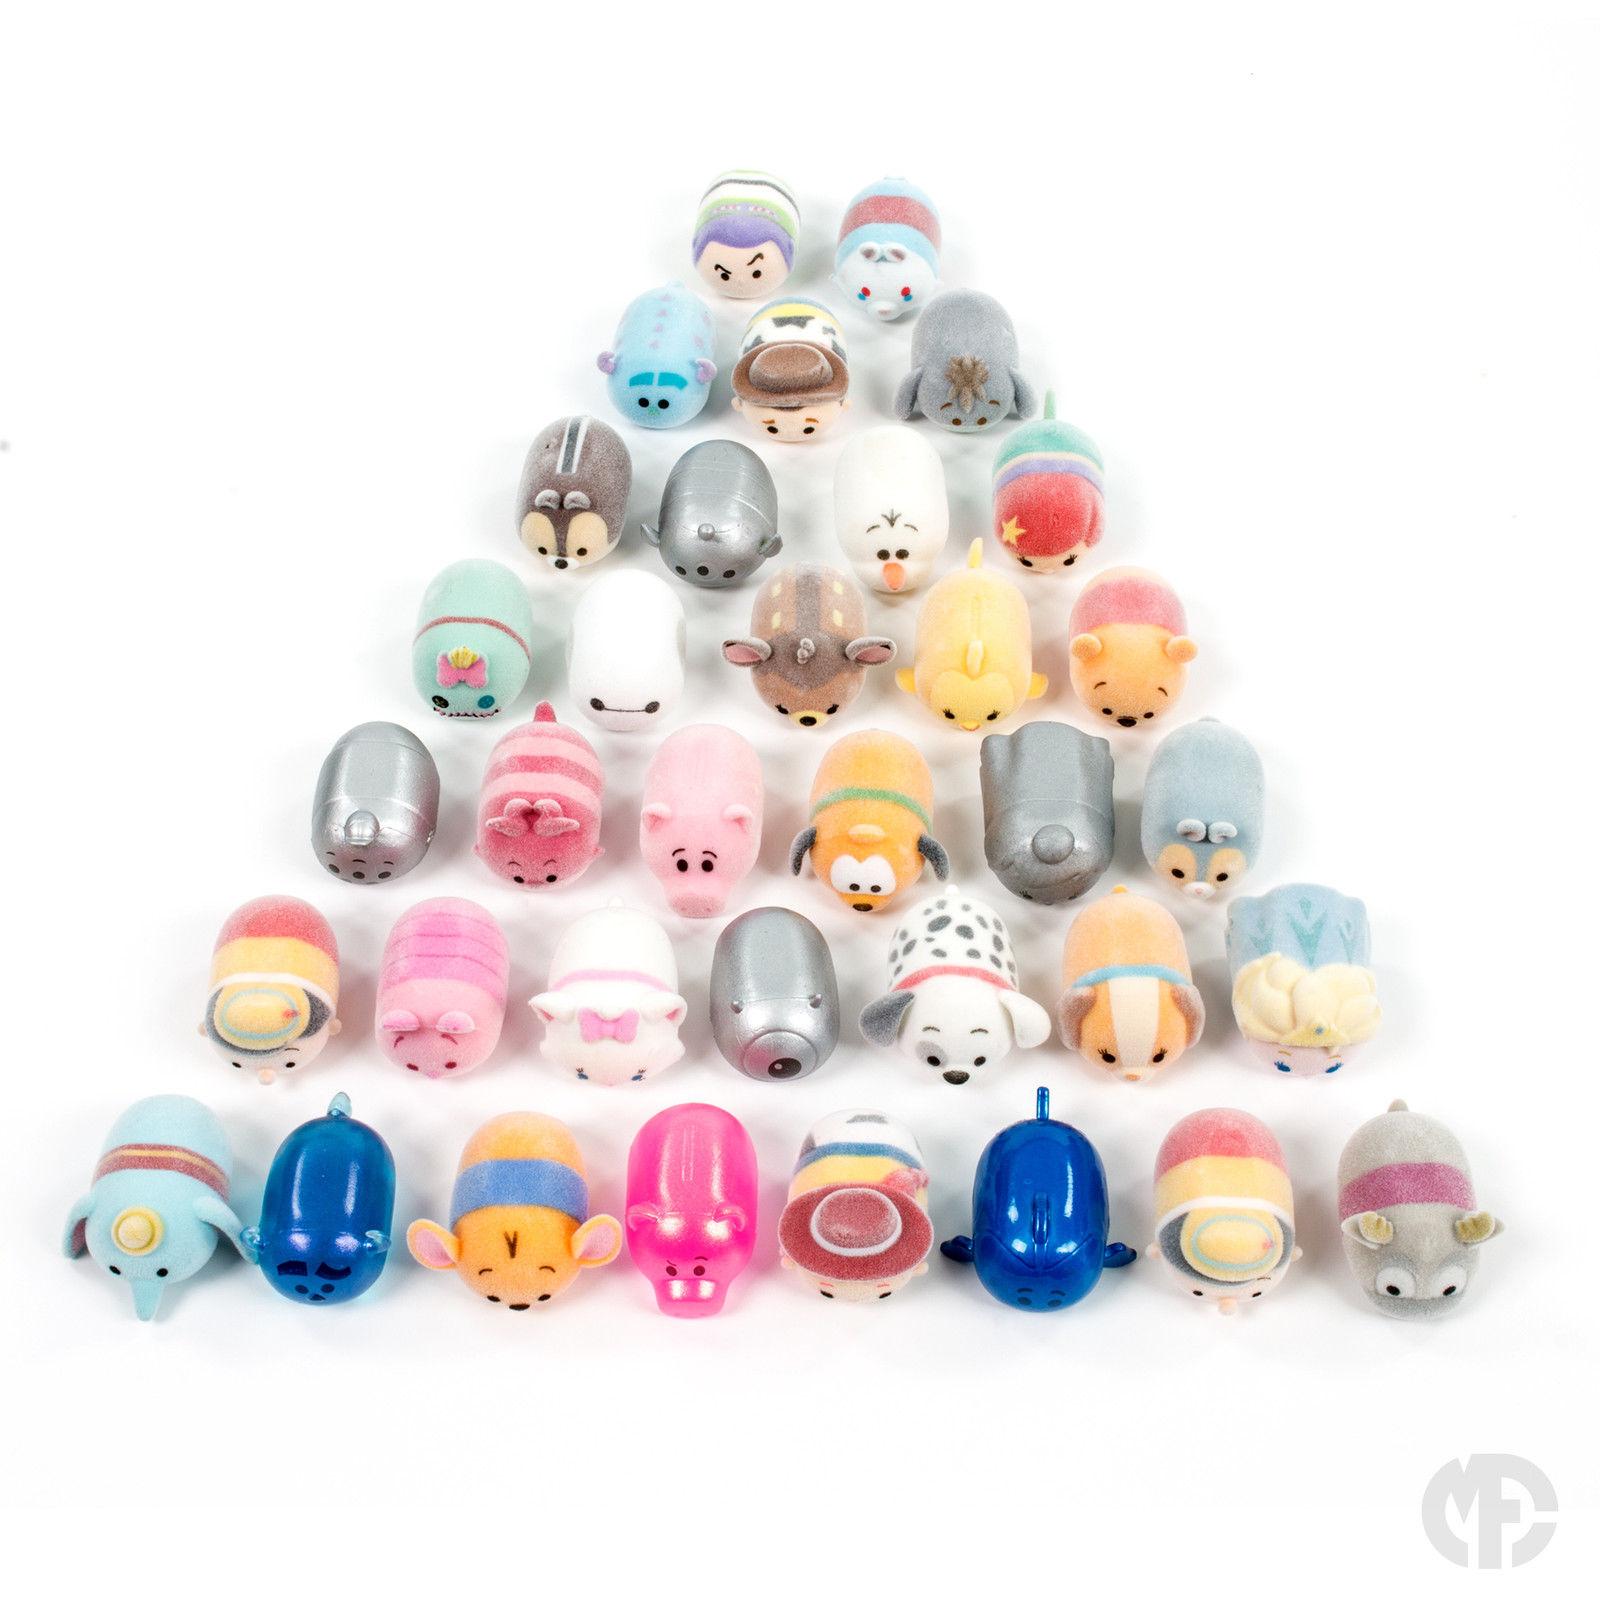 Disney Tsum Tsum Squishies - Series 2 Fuzzy Feel Figures - Choose your Figure eBay